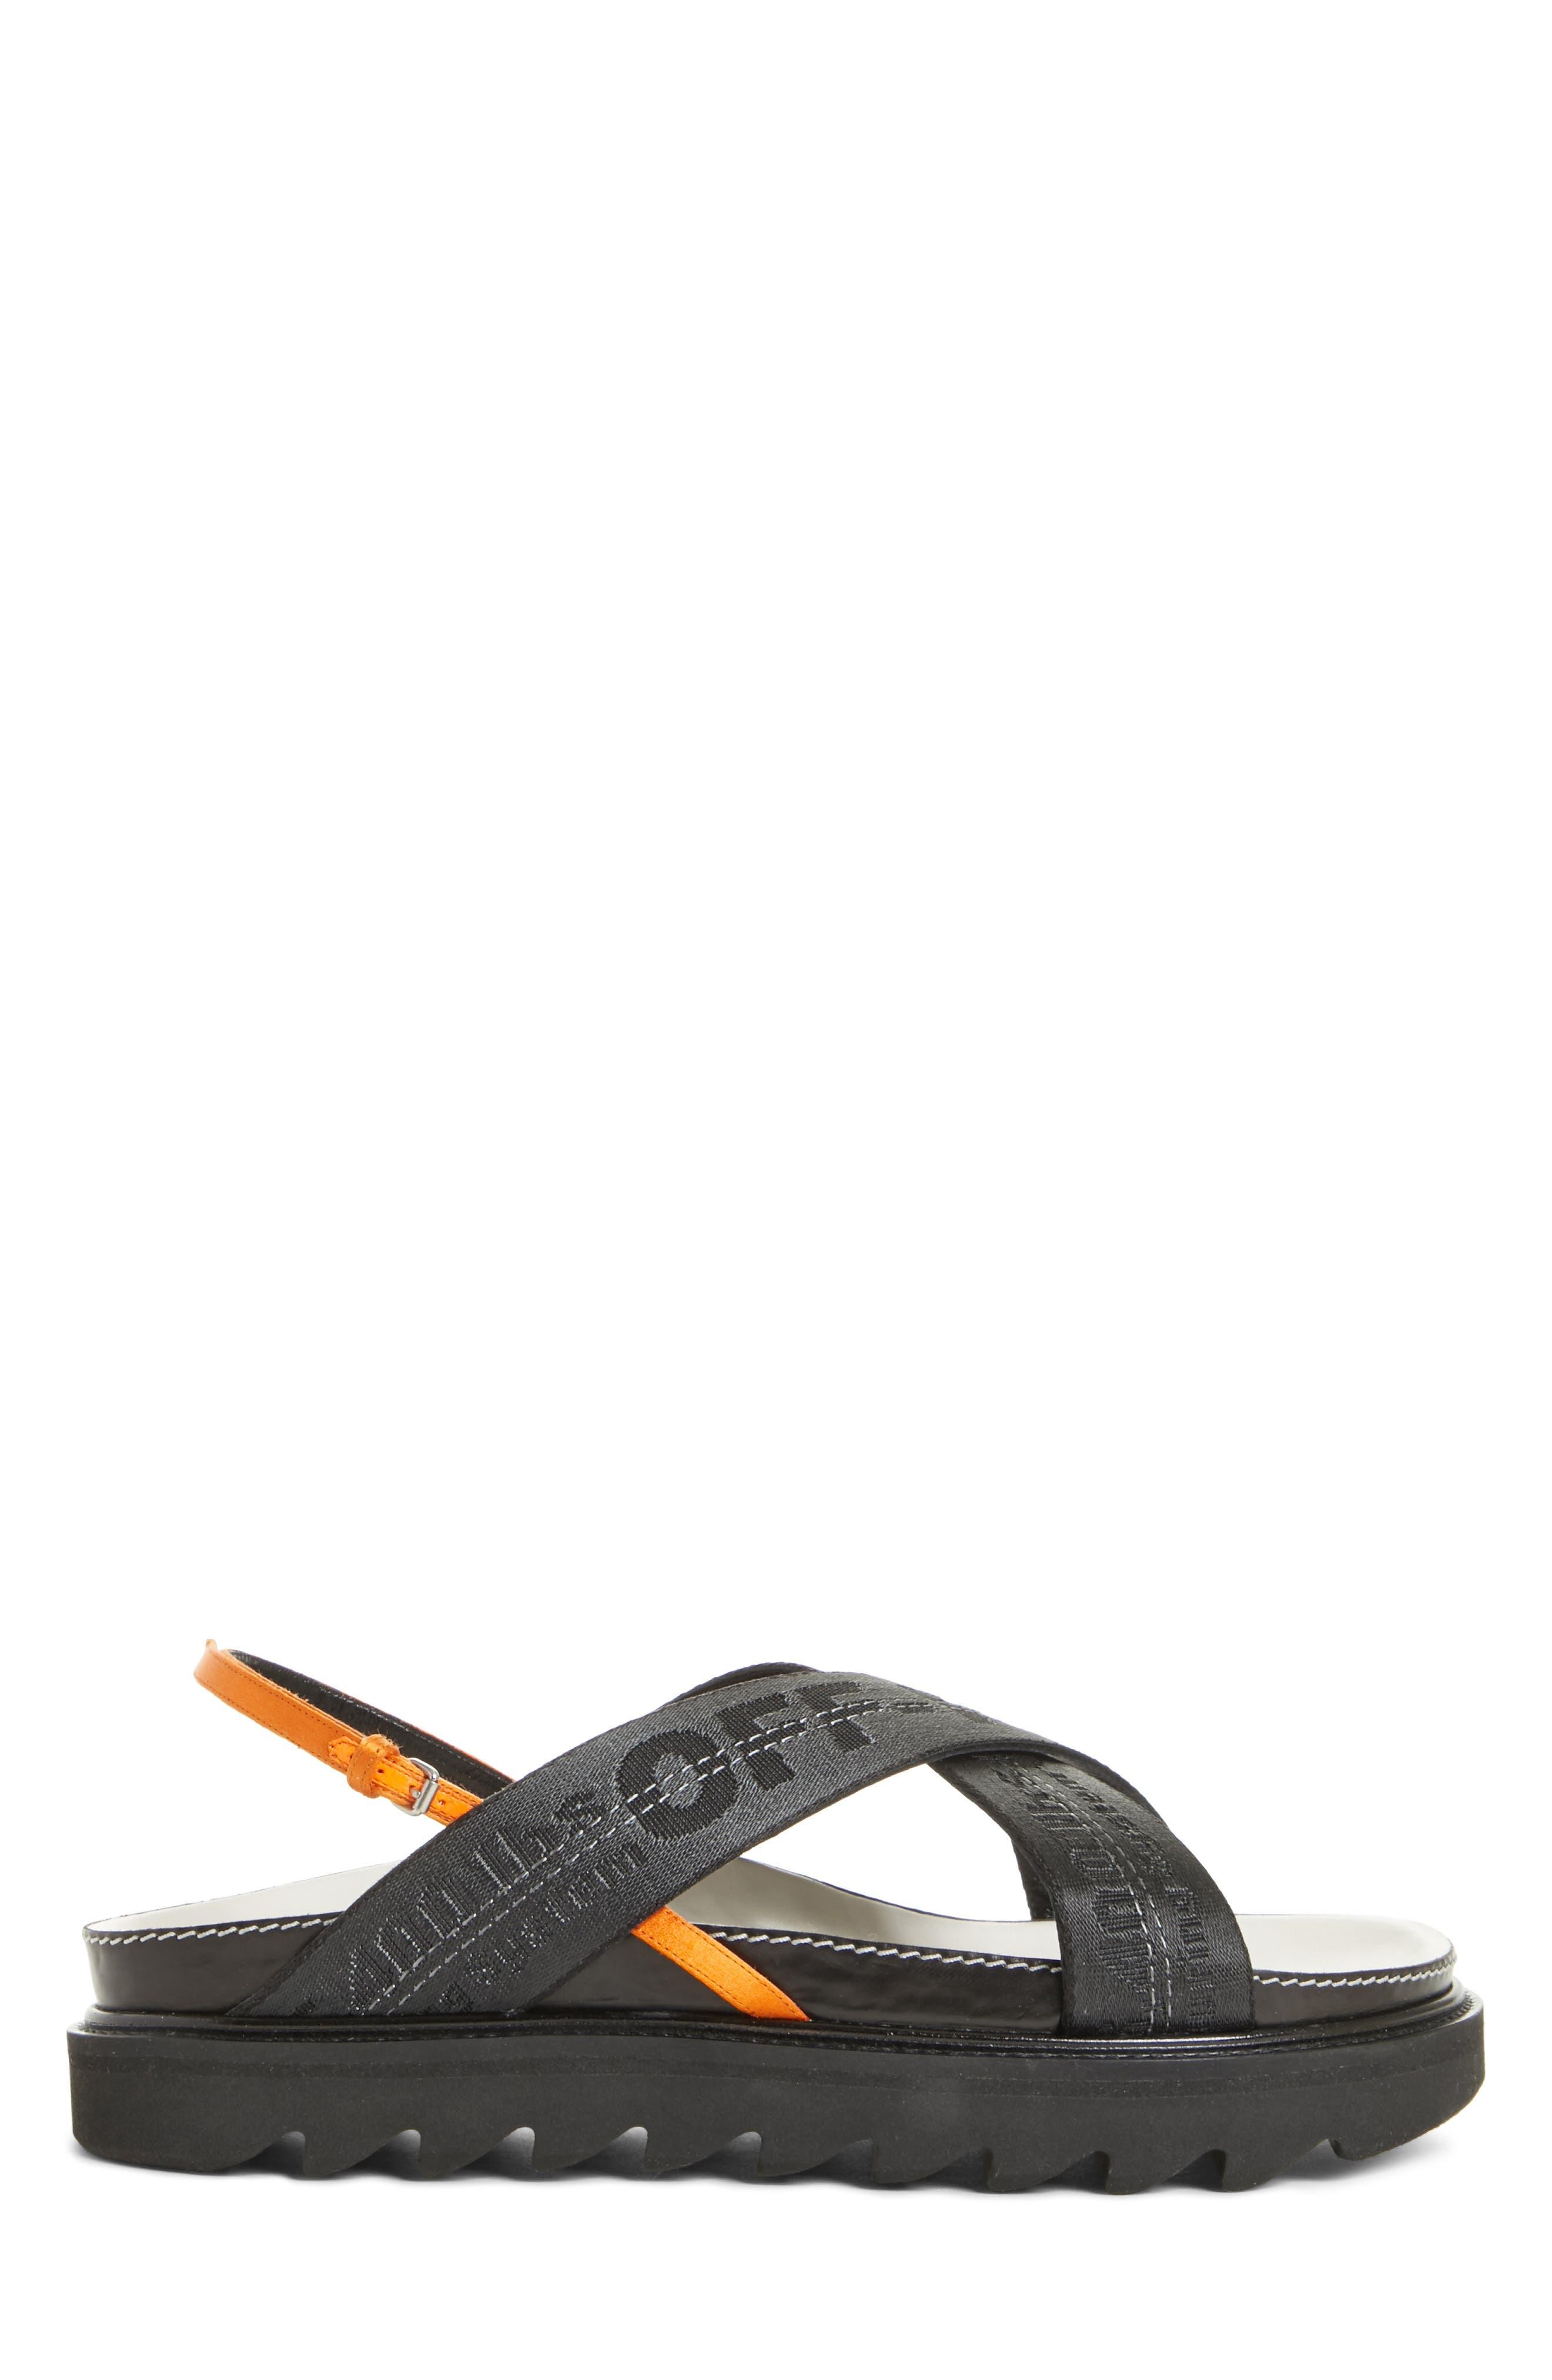 Industrial Belt Sandal,                             Alternate thumbnail 3, color,                             Black Black